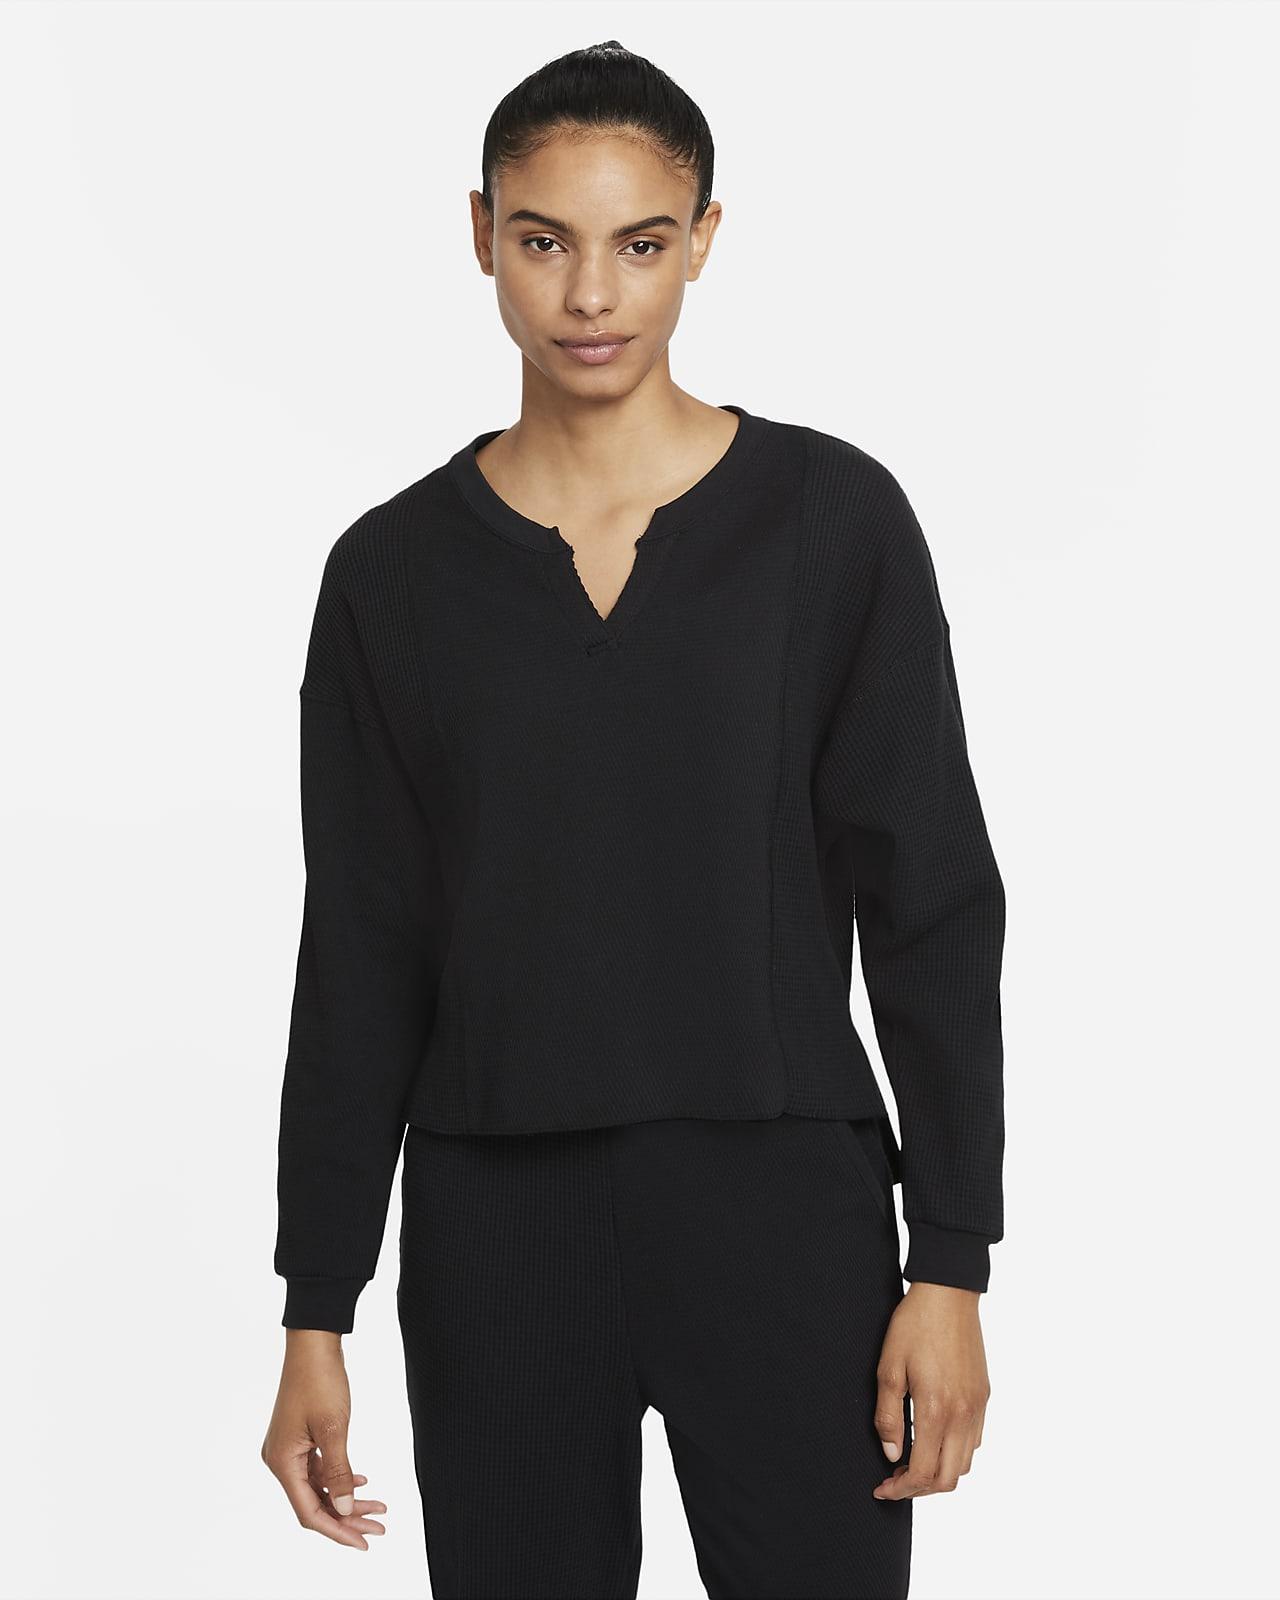 Sudadera para mujer Nike Yoga Dri-FIT Luxe